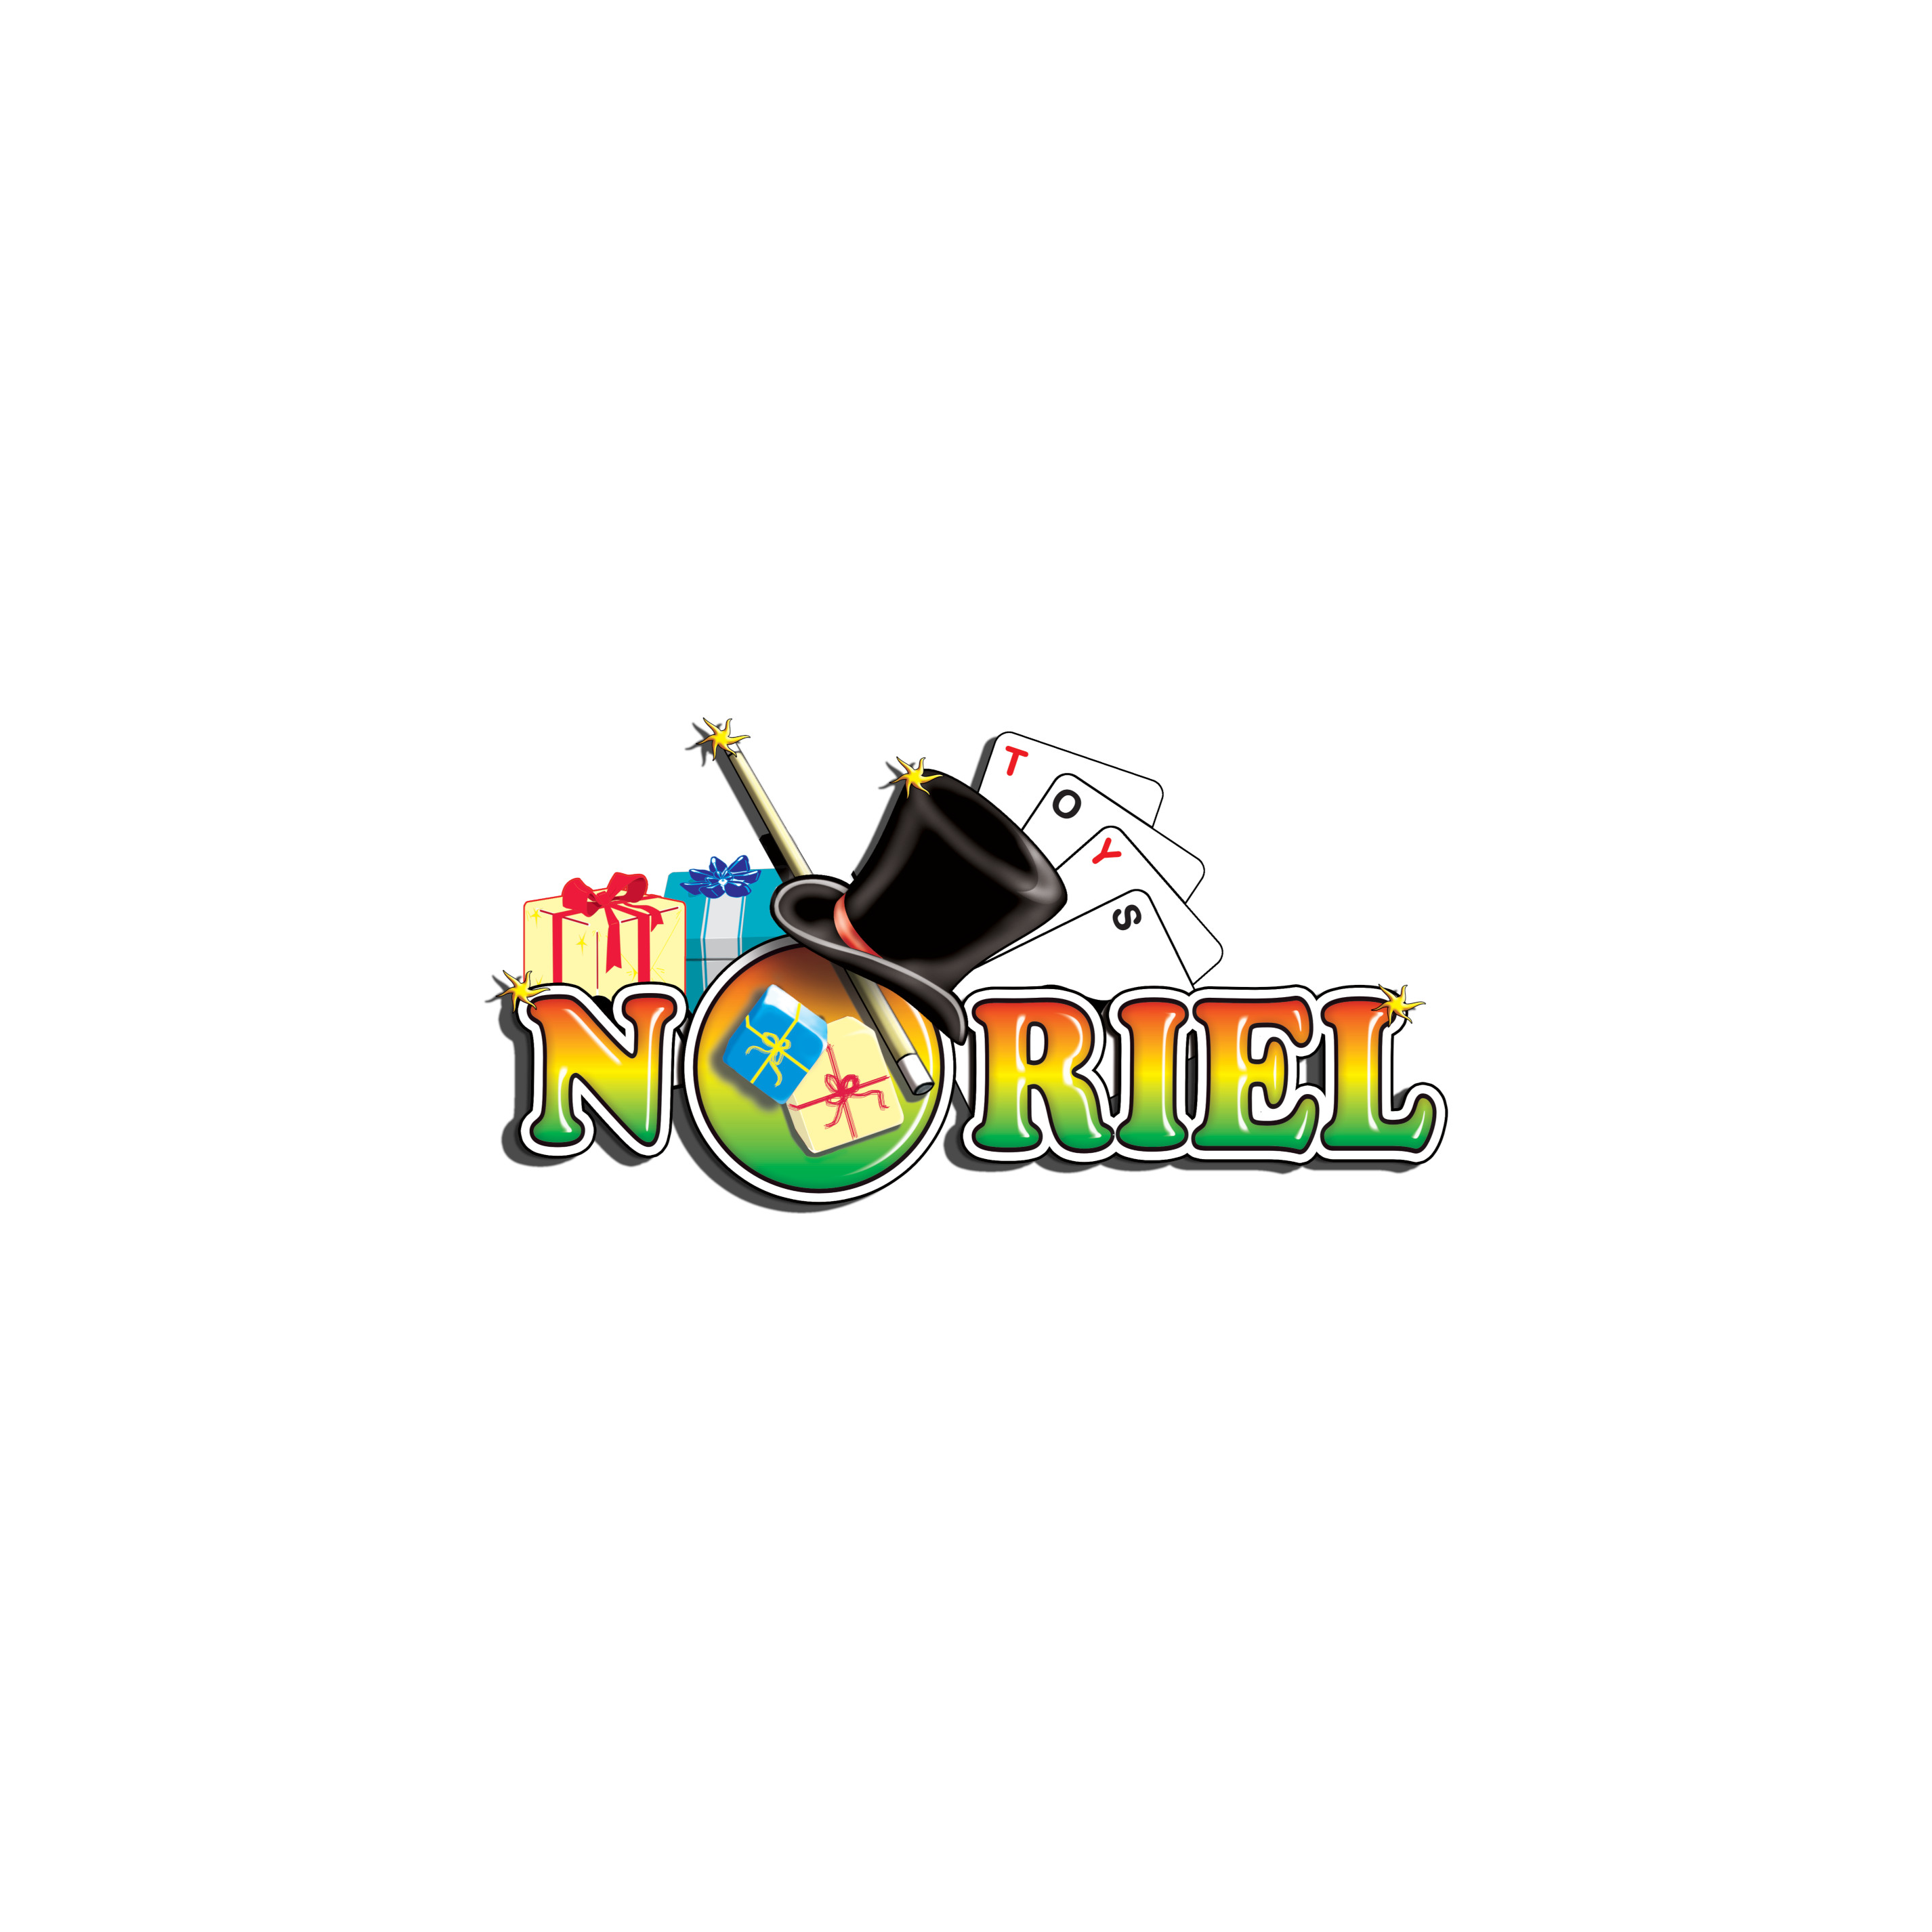 Masinuta de jucarie Dickie Toys Racing, Black